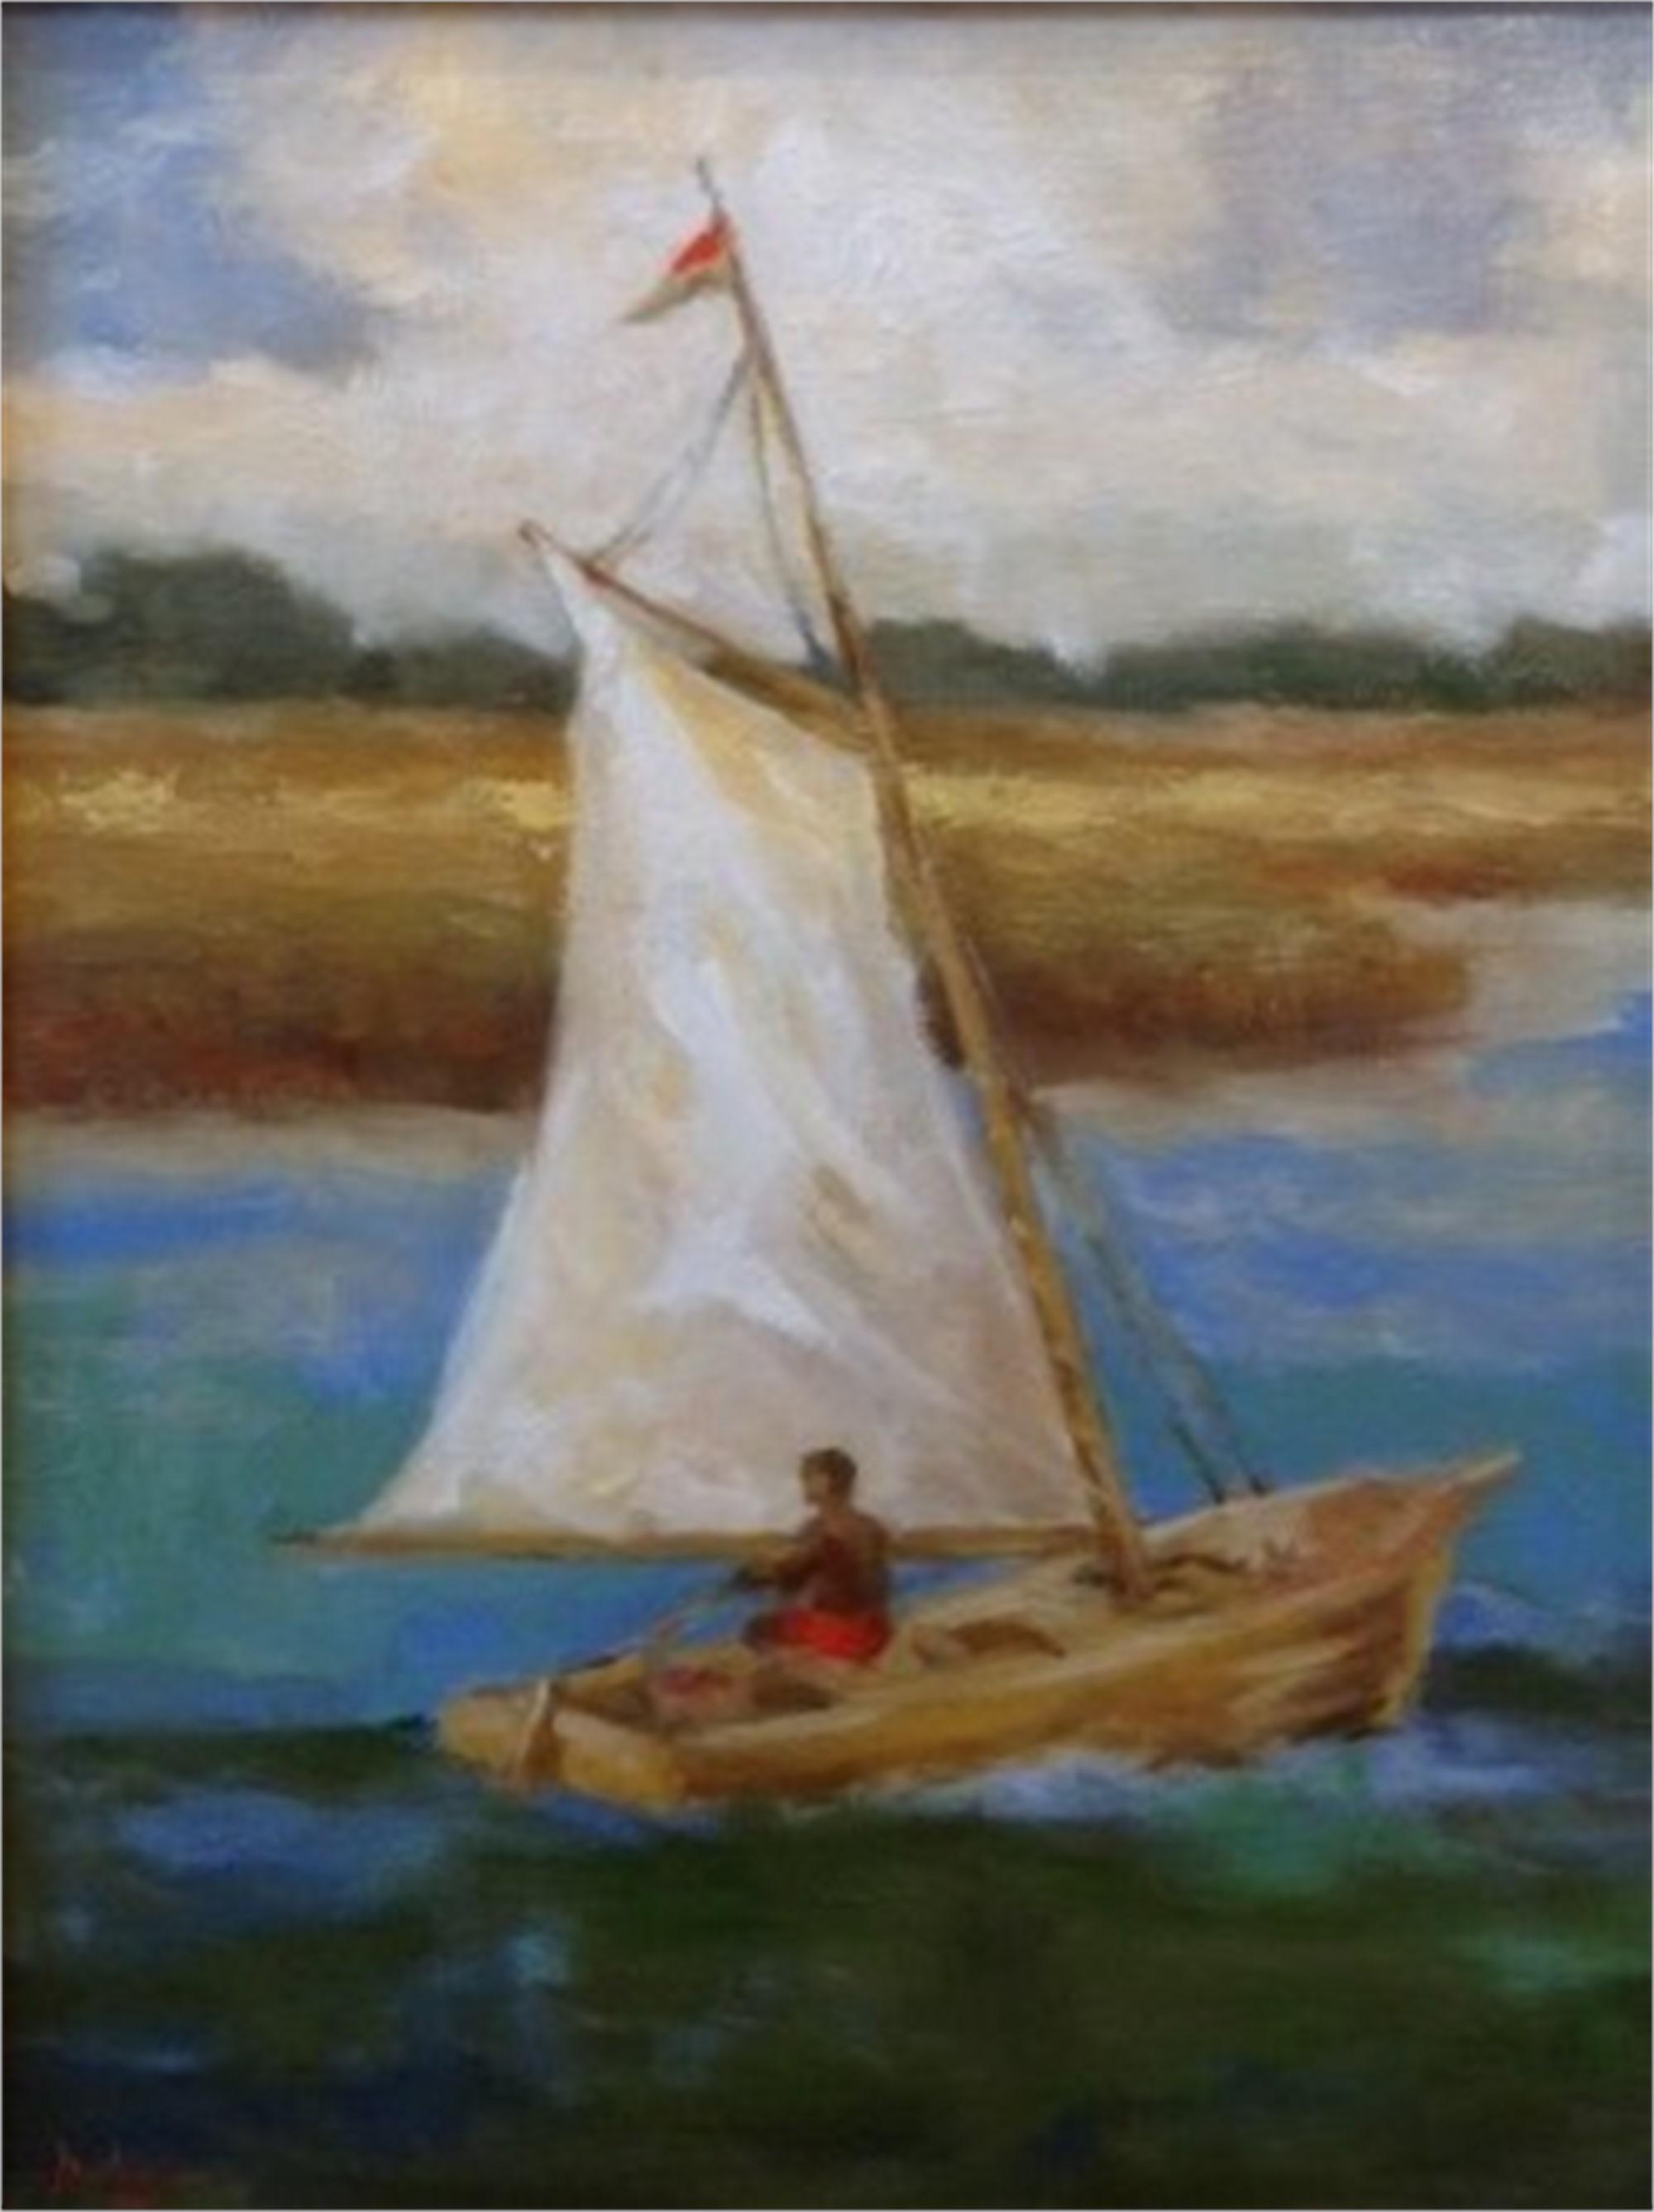 Afternoon Sail by Jim Darlington